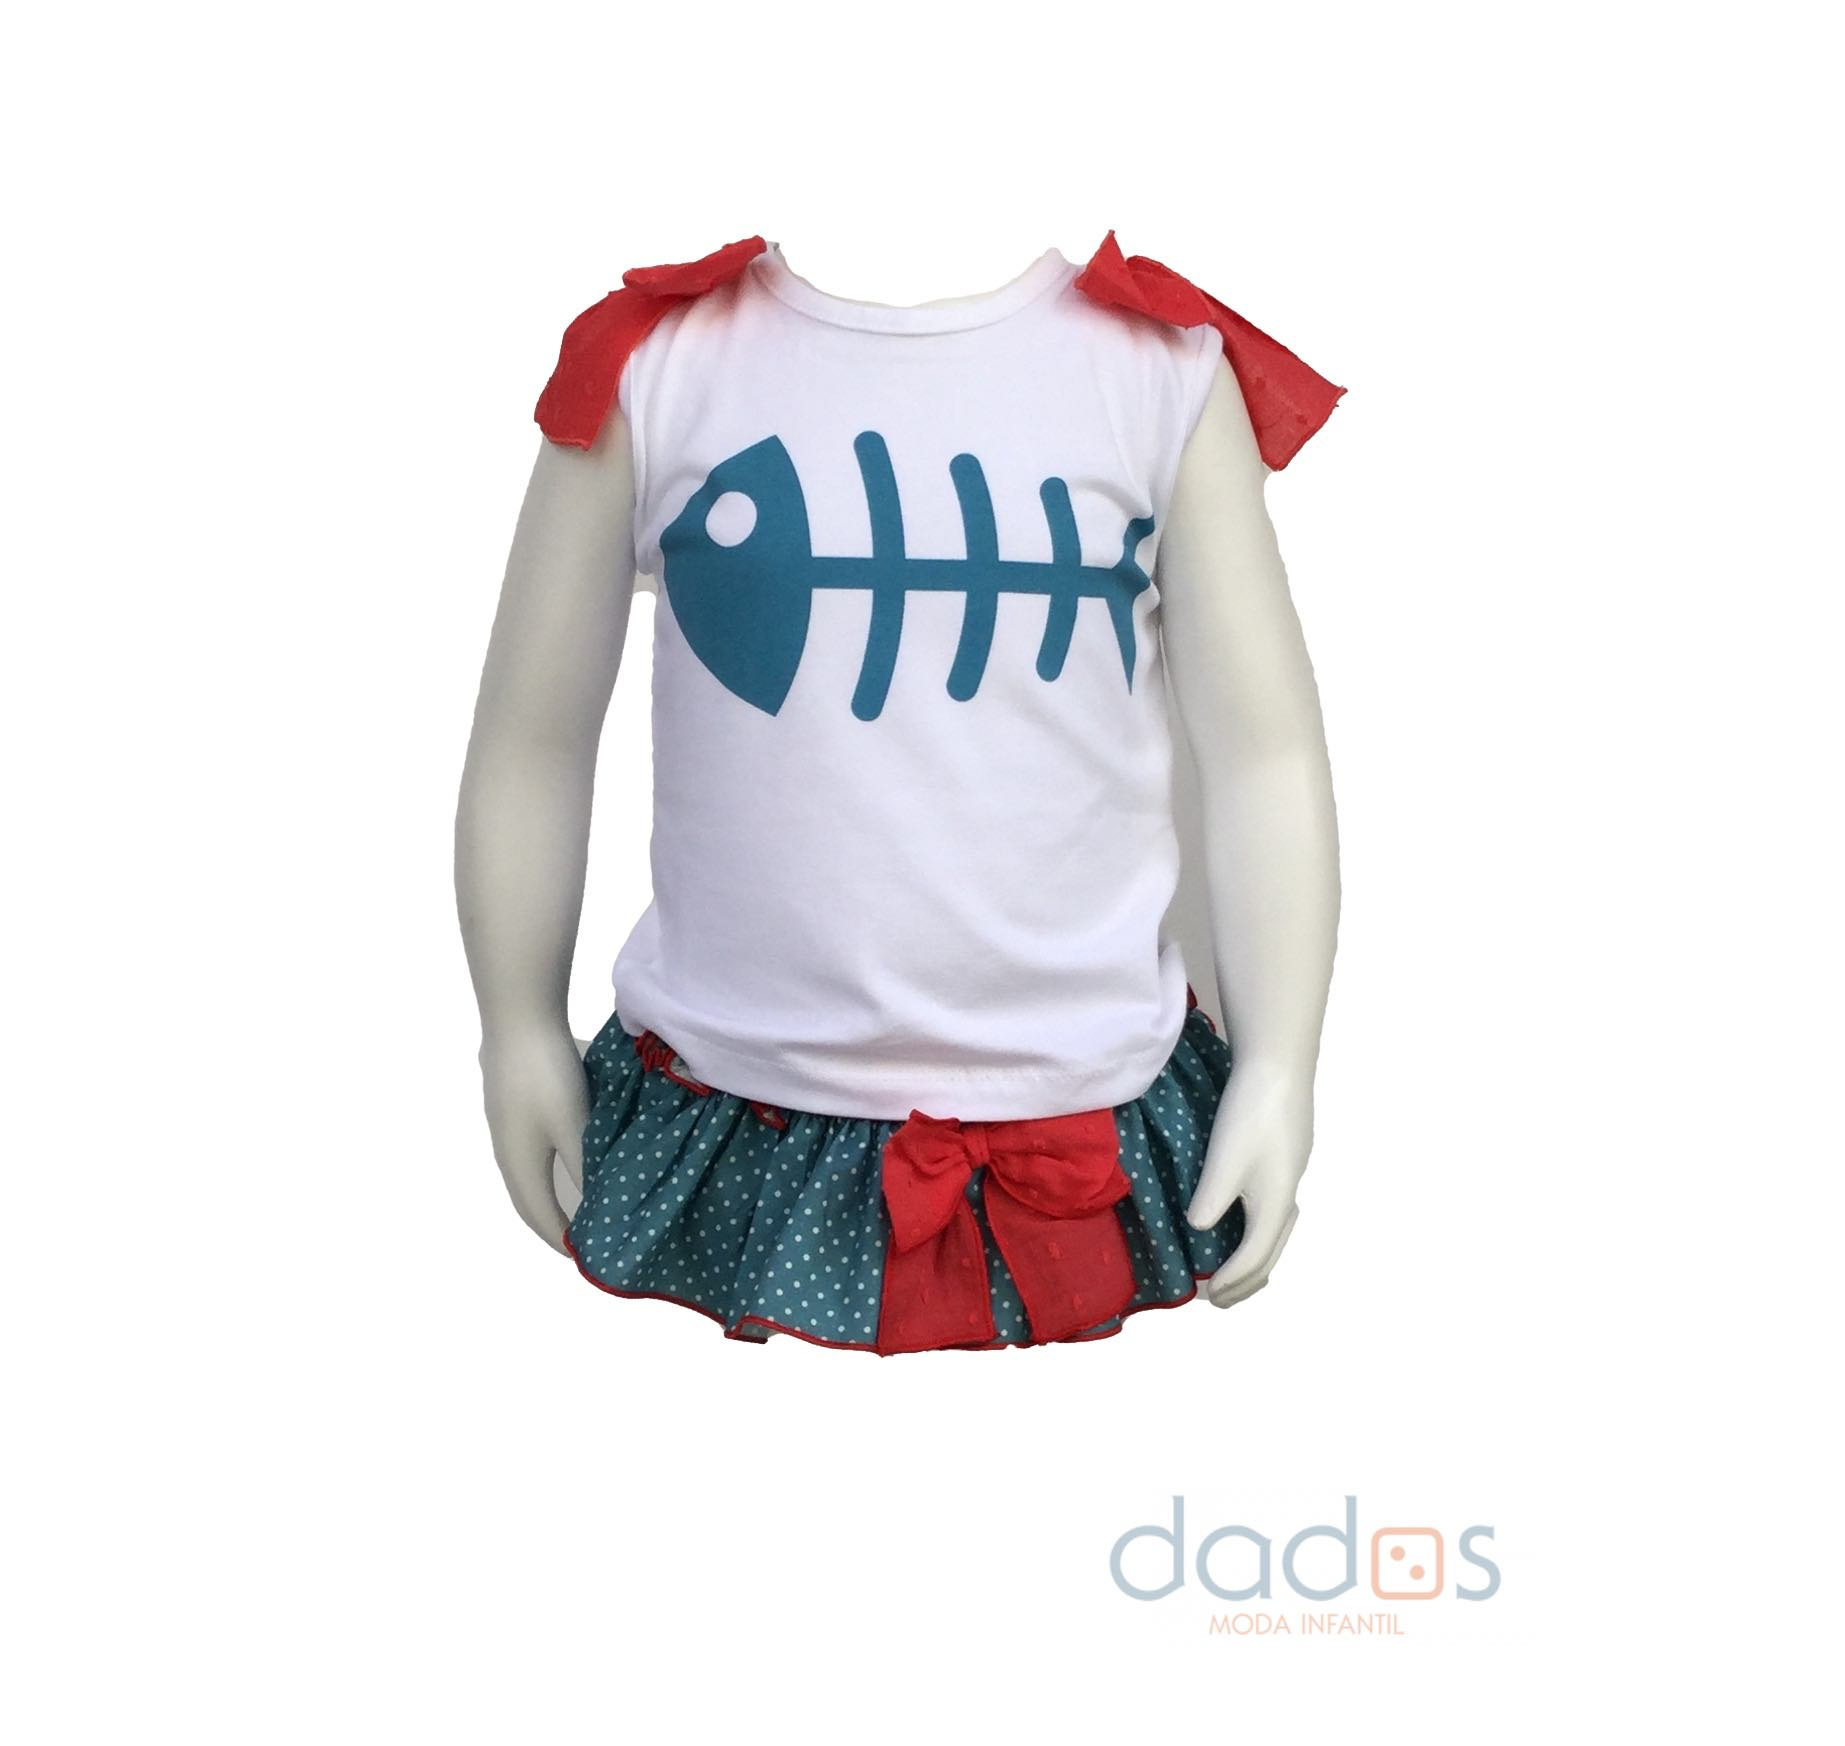 c61347e20 Mon Petit Bonbon conjunto camiseta pez y cubre verde - Dados